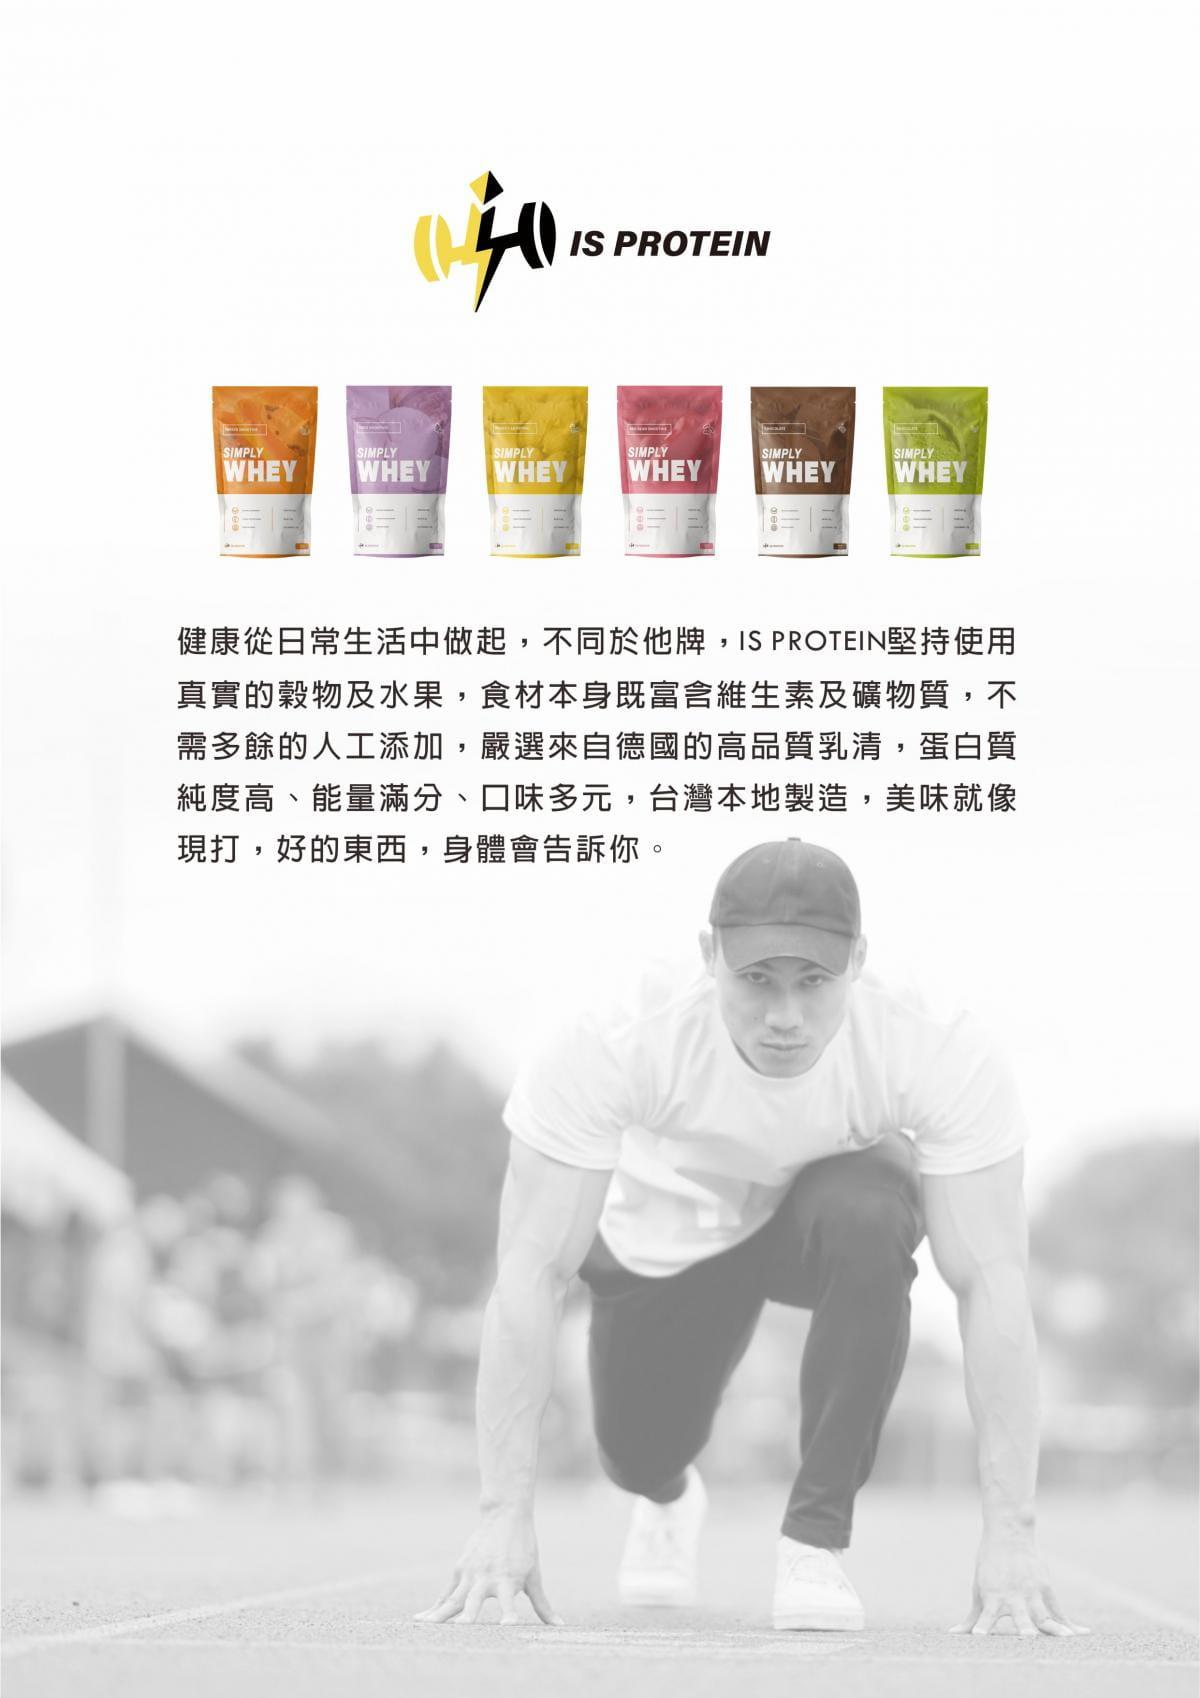 【LEXPORTS 勵動風潮】IS PROTEIN 乳清蛋白飲 - 單包裝(25g/包) 1